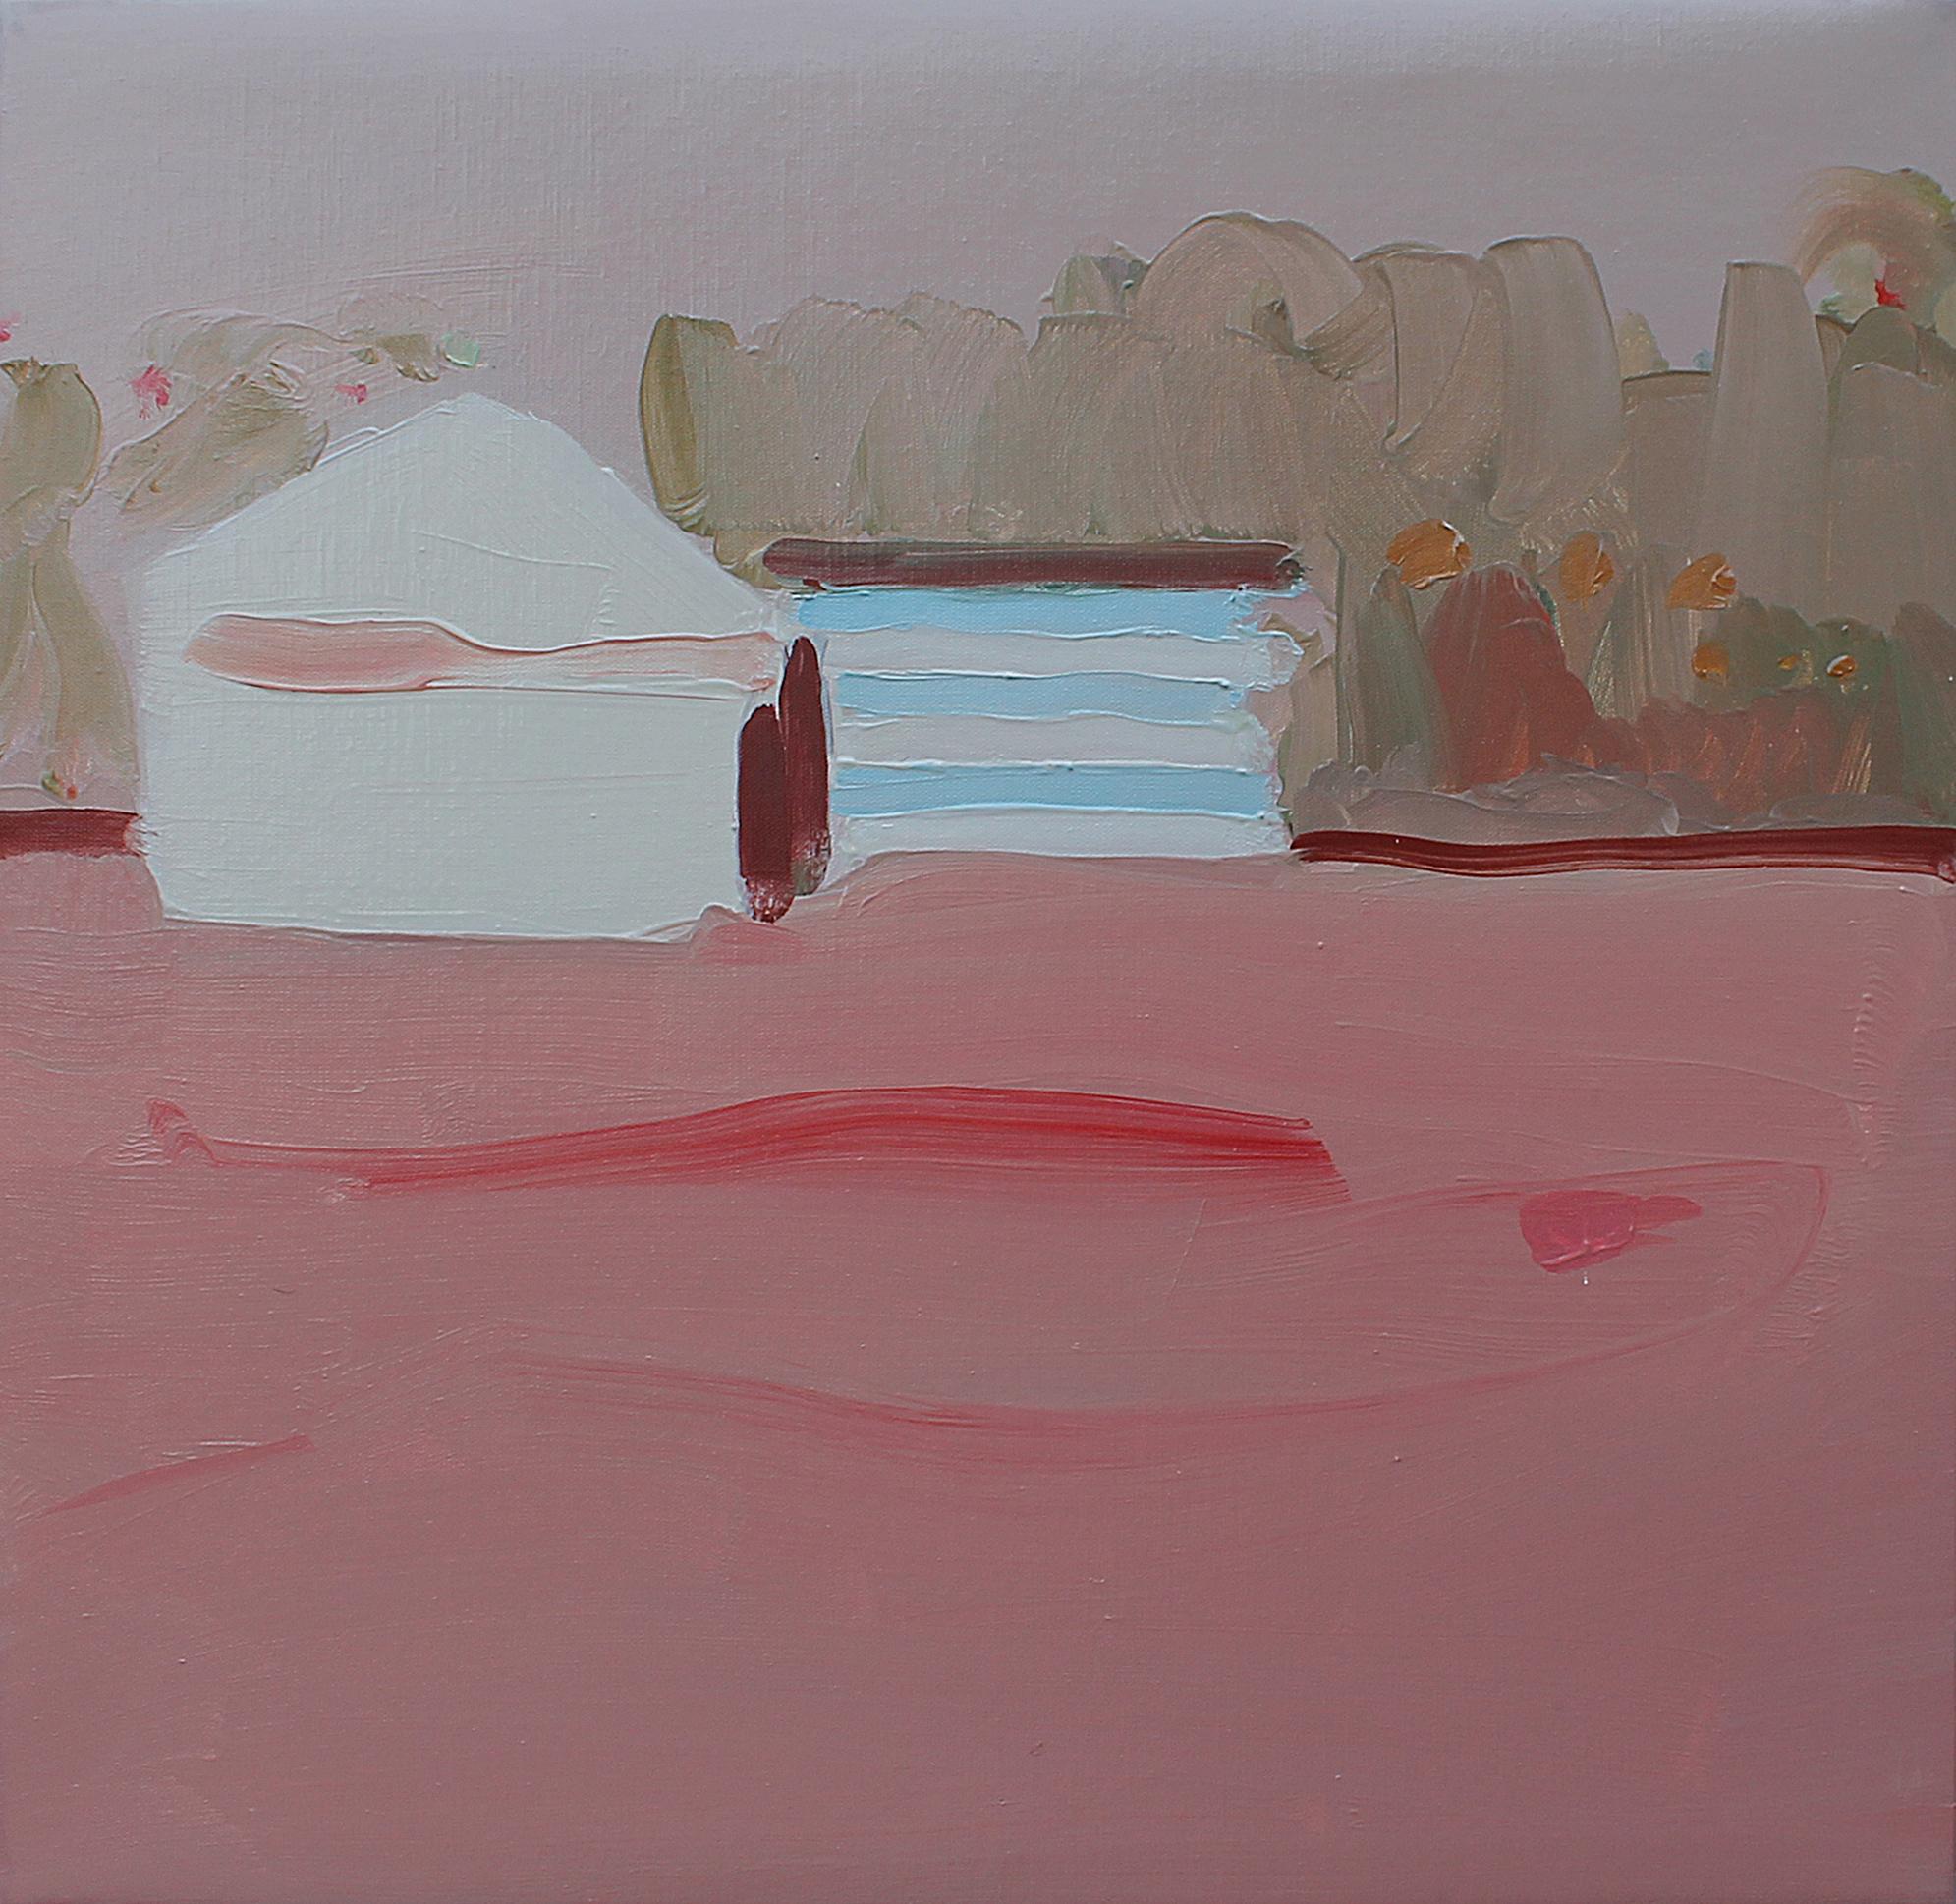 Francesco Cocco, Asfalto 2016, olio su tela, 40 x 40 cm